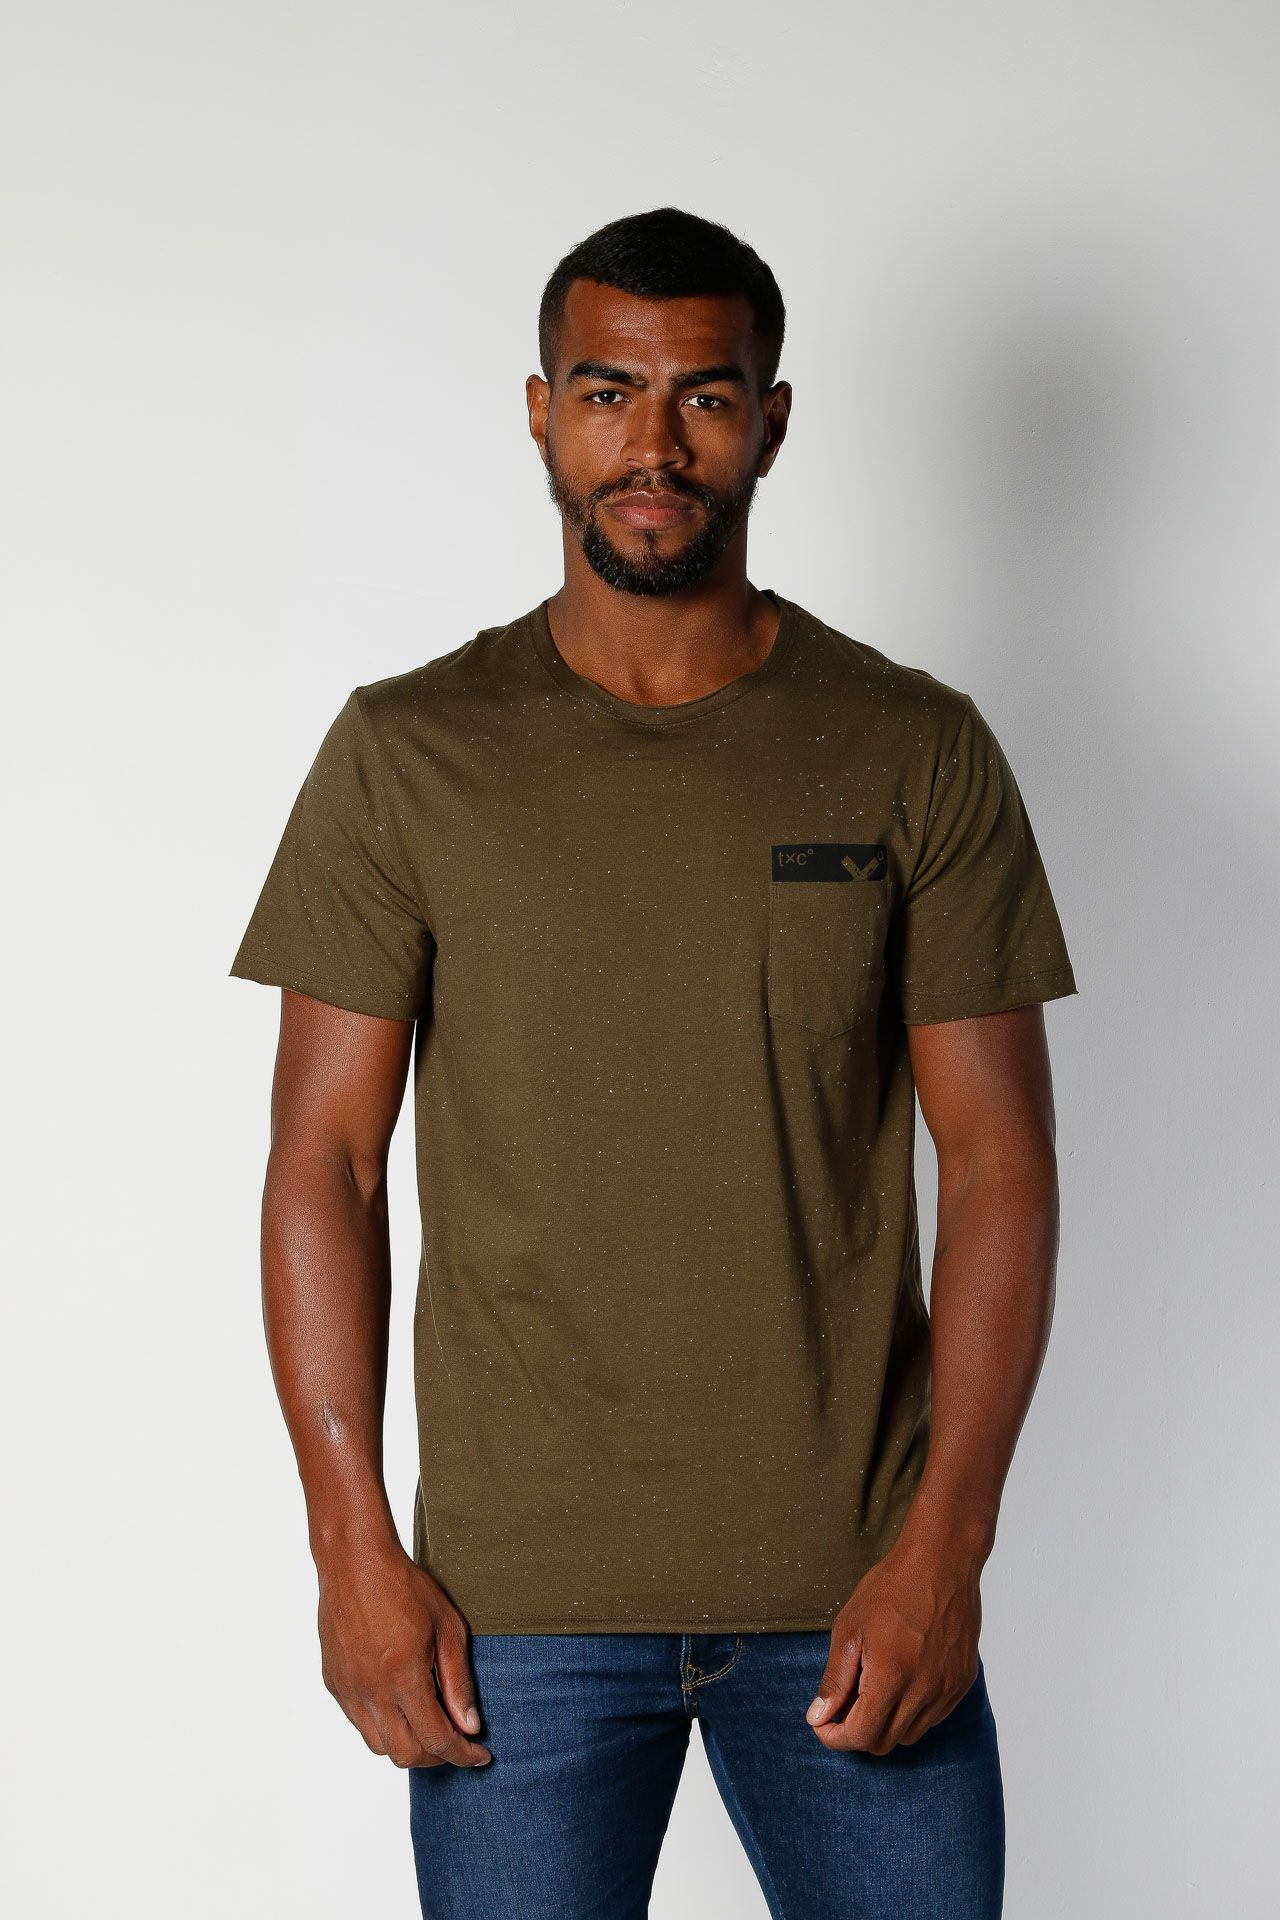 Camiseta Masculina TXC 1976